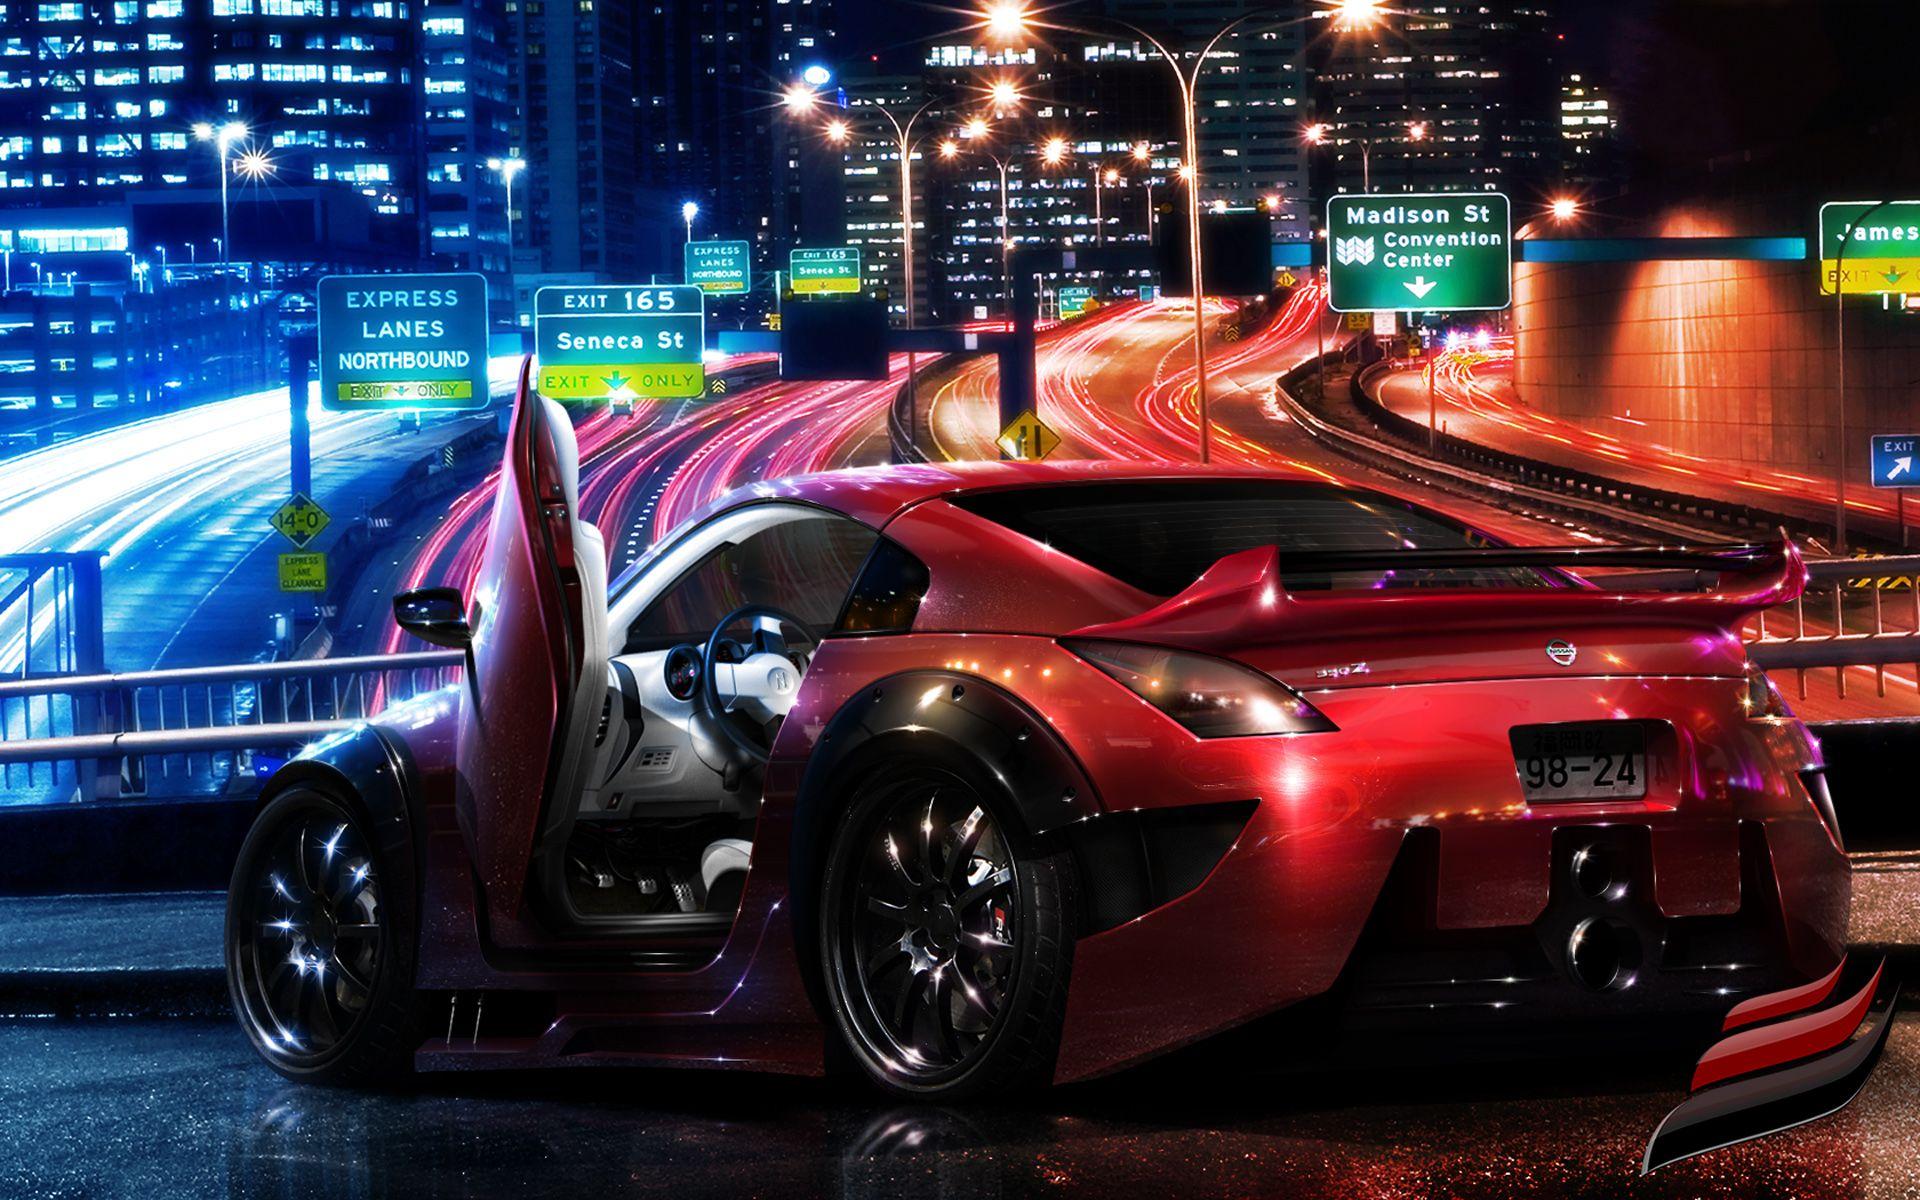 Delightful Cool Car Wallpaper Photo #5i6